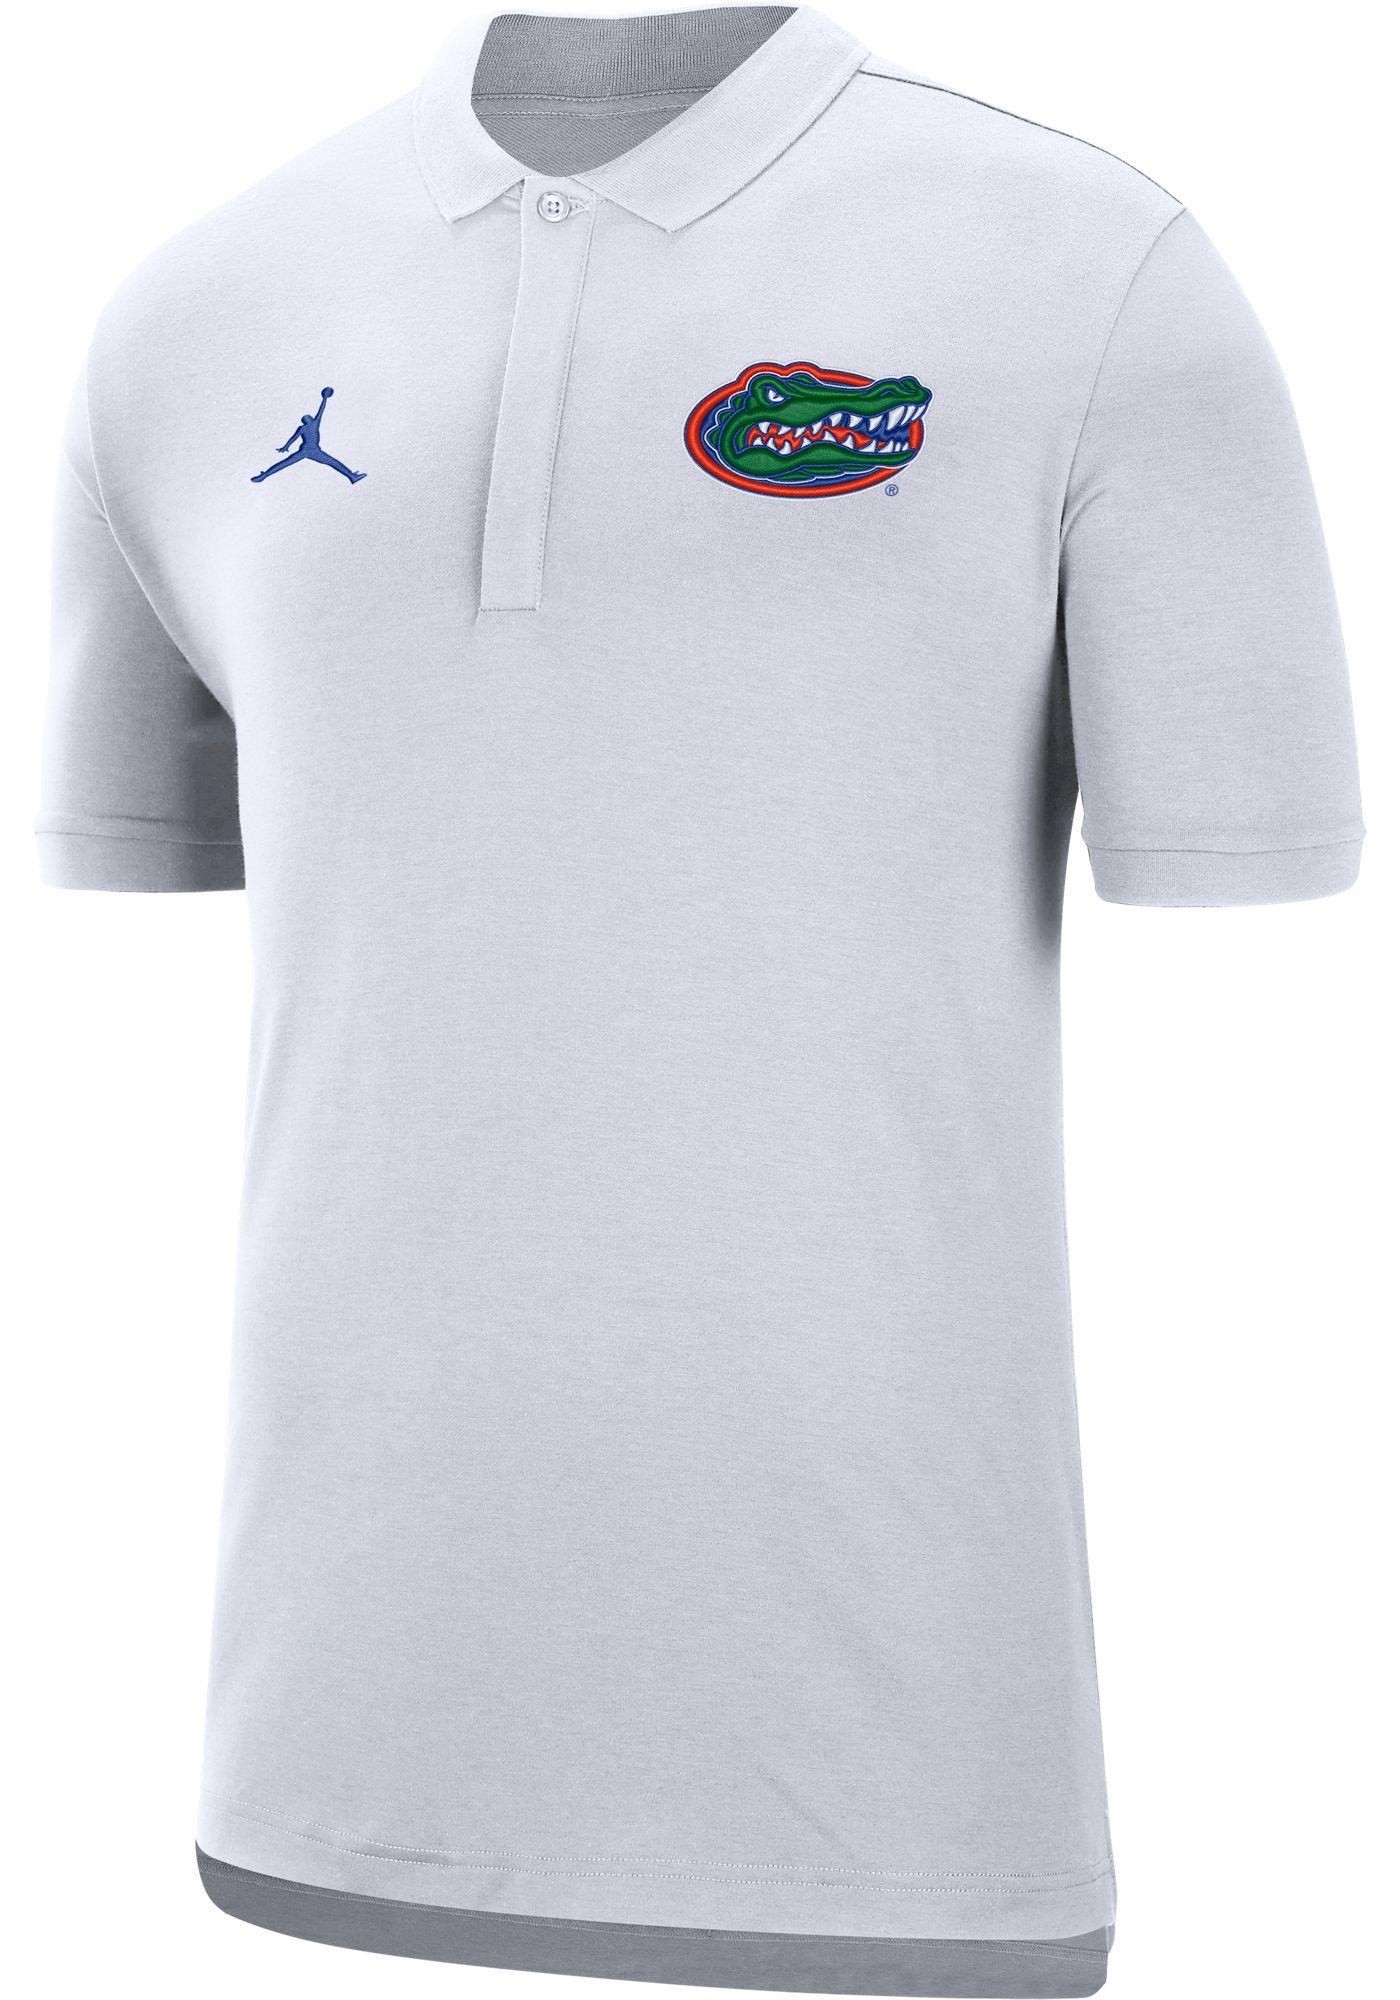 Jordan Men's Florida Gators Dri-FIT Elite Football Sideline White Polo